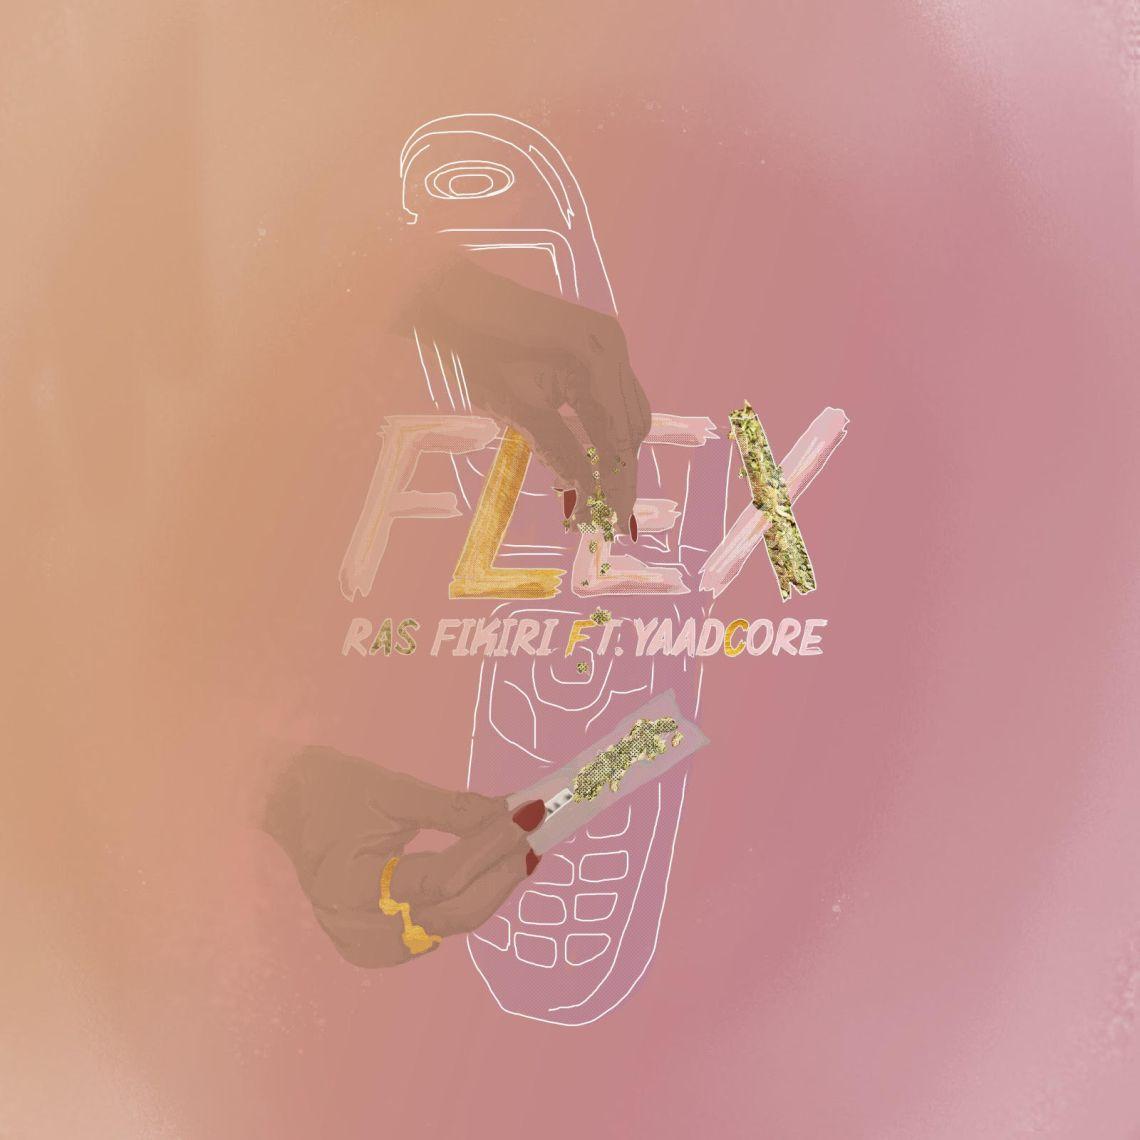 Ras Fikiri feat. Yaadcore - Flex